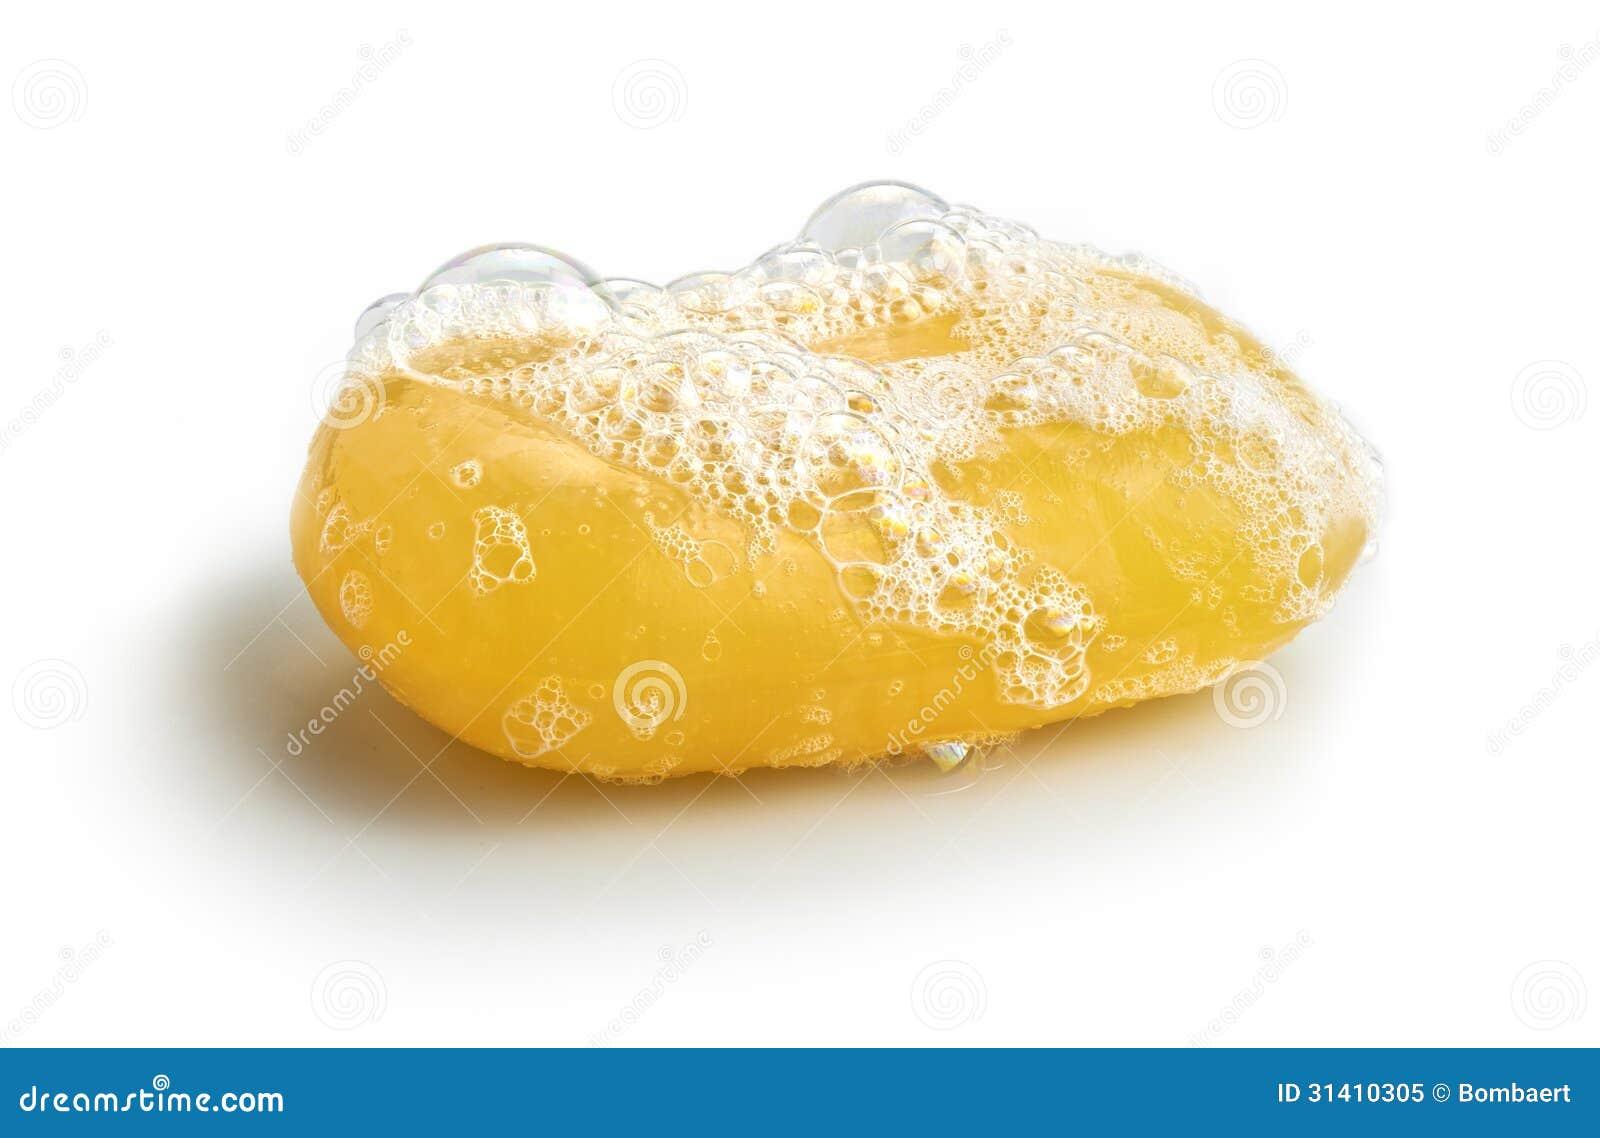 Imagenes De Jabon De Baño:Yellow Soap Bubbles